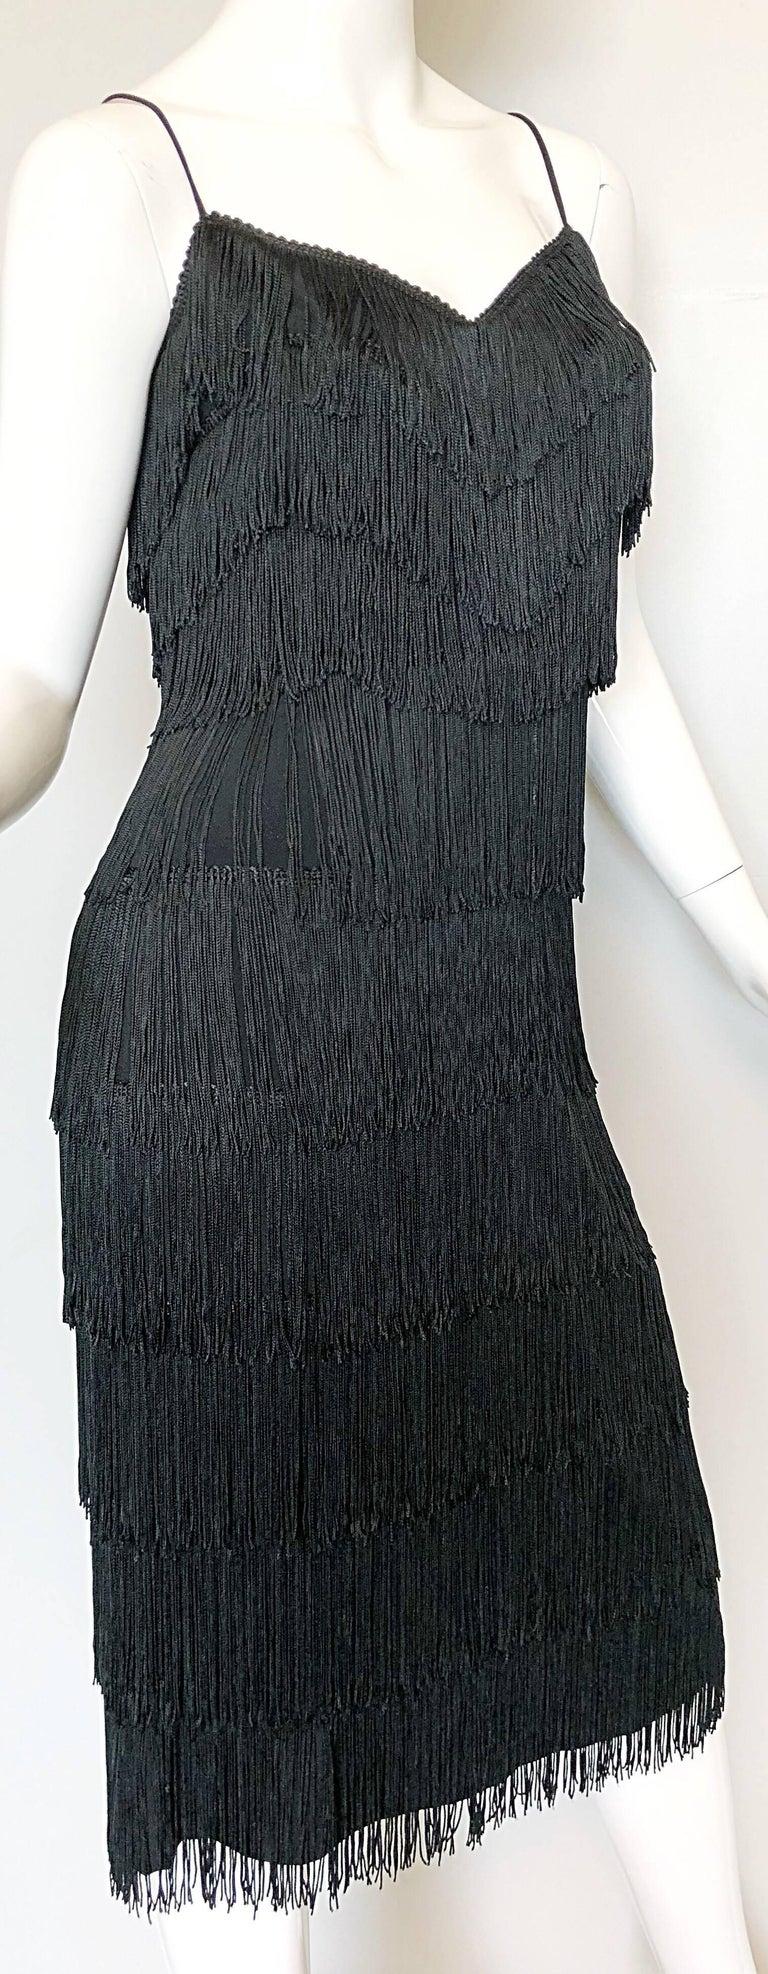 1970s Lilli Diamond Black Fully Fringed Vintage Flapper Style 70s Cocktail Dress For Sale 2